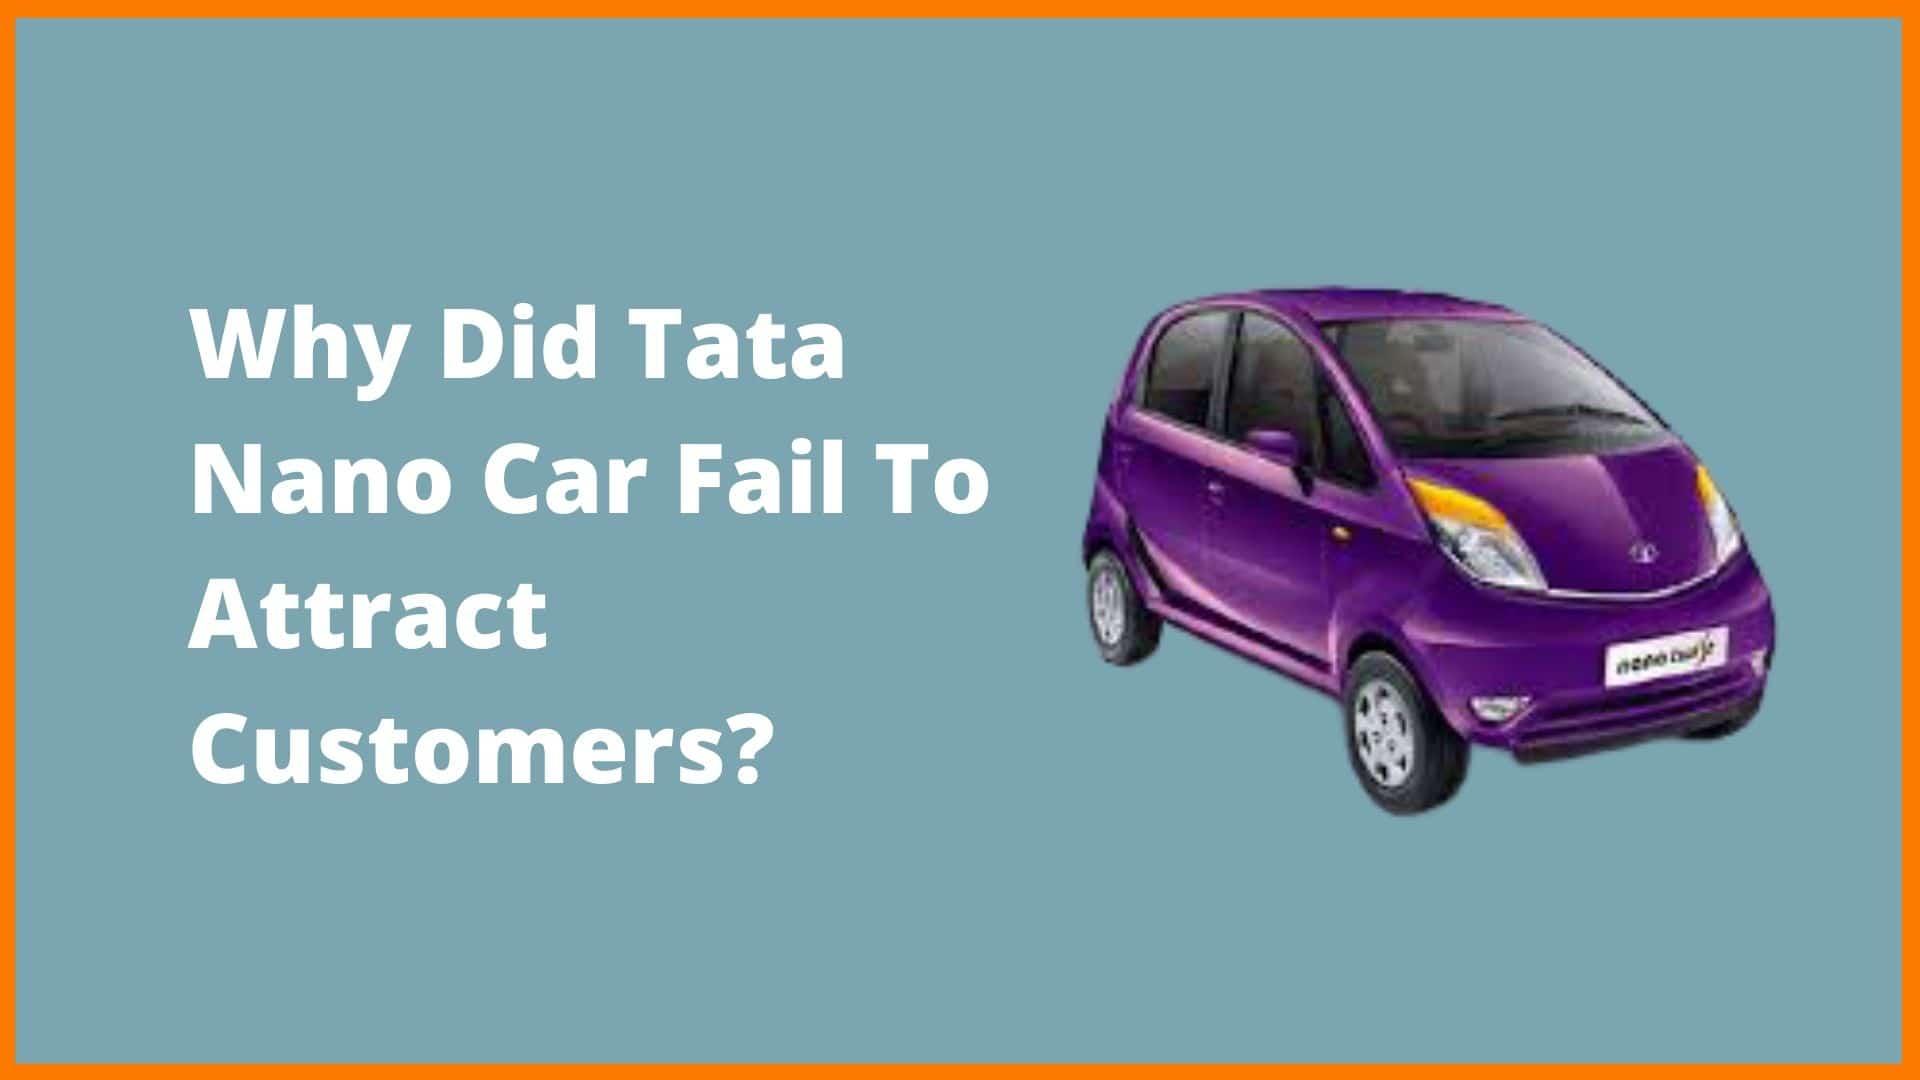 Tata Nano's Failure To Attract Customers [Tata Nano Case Study]